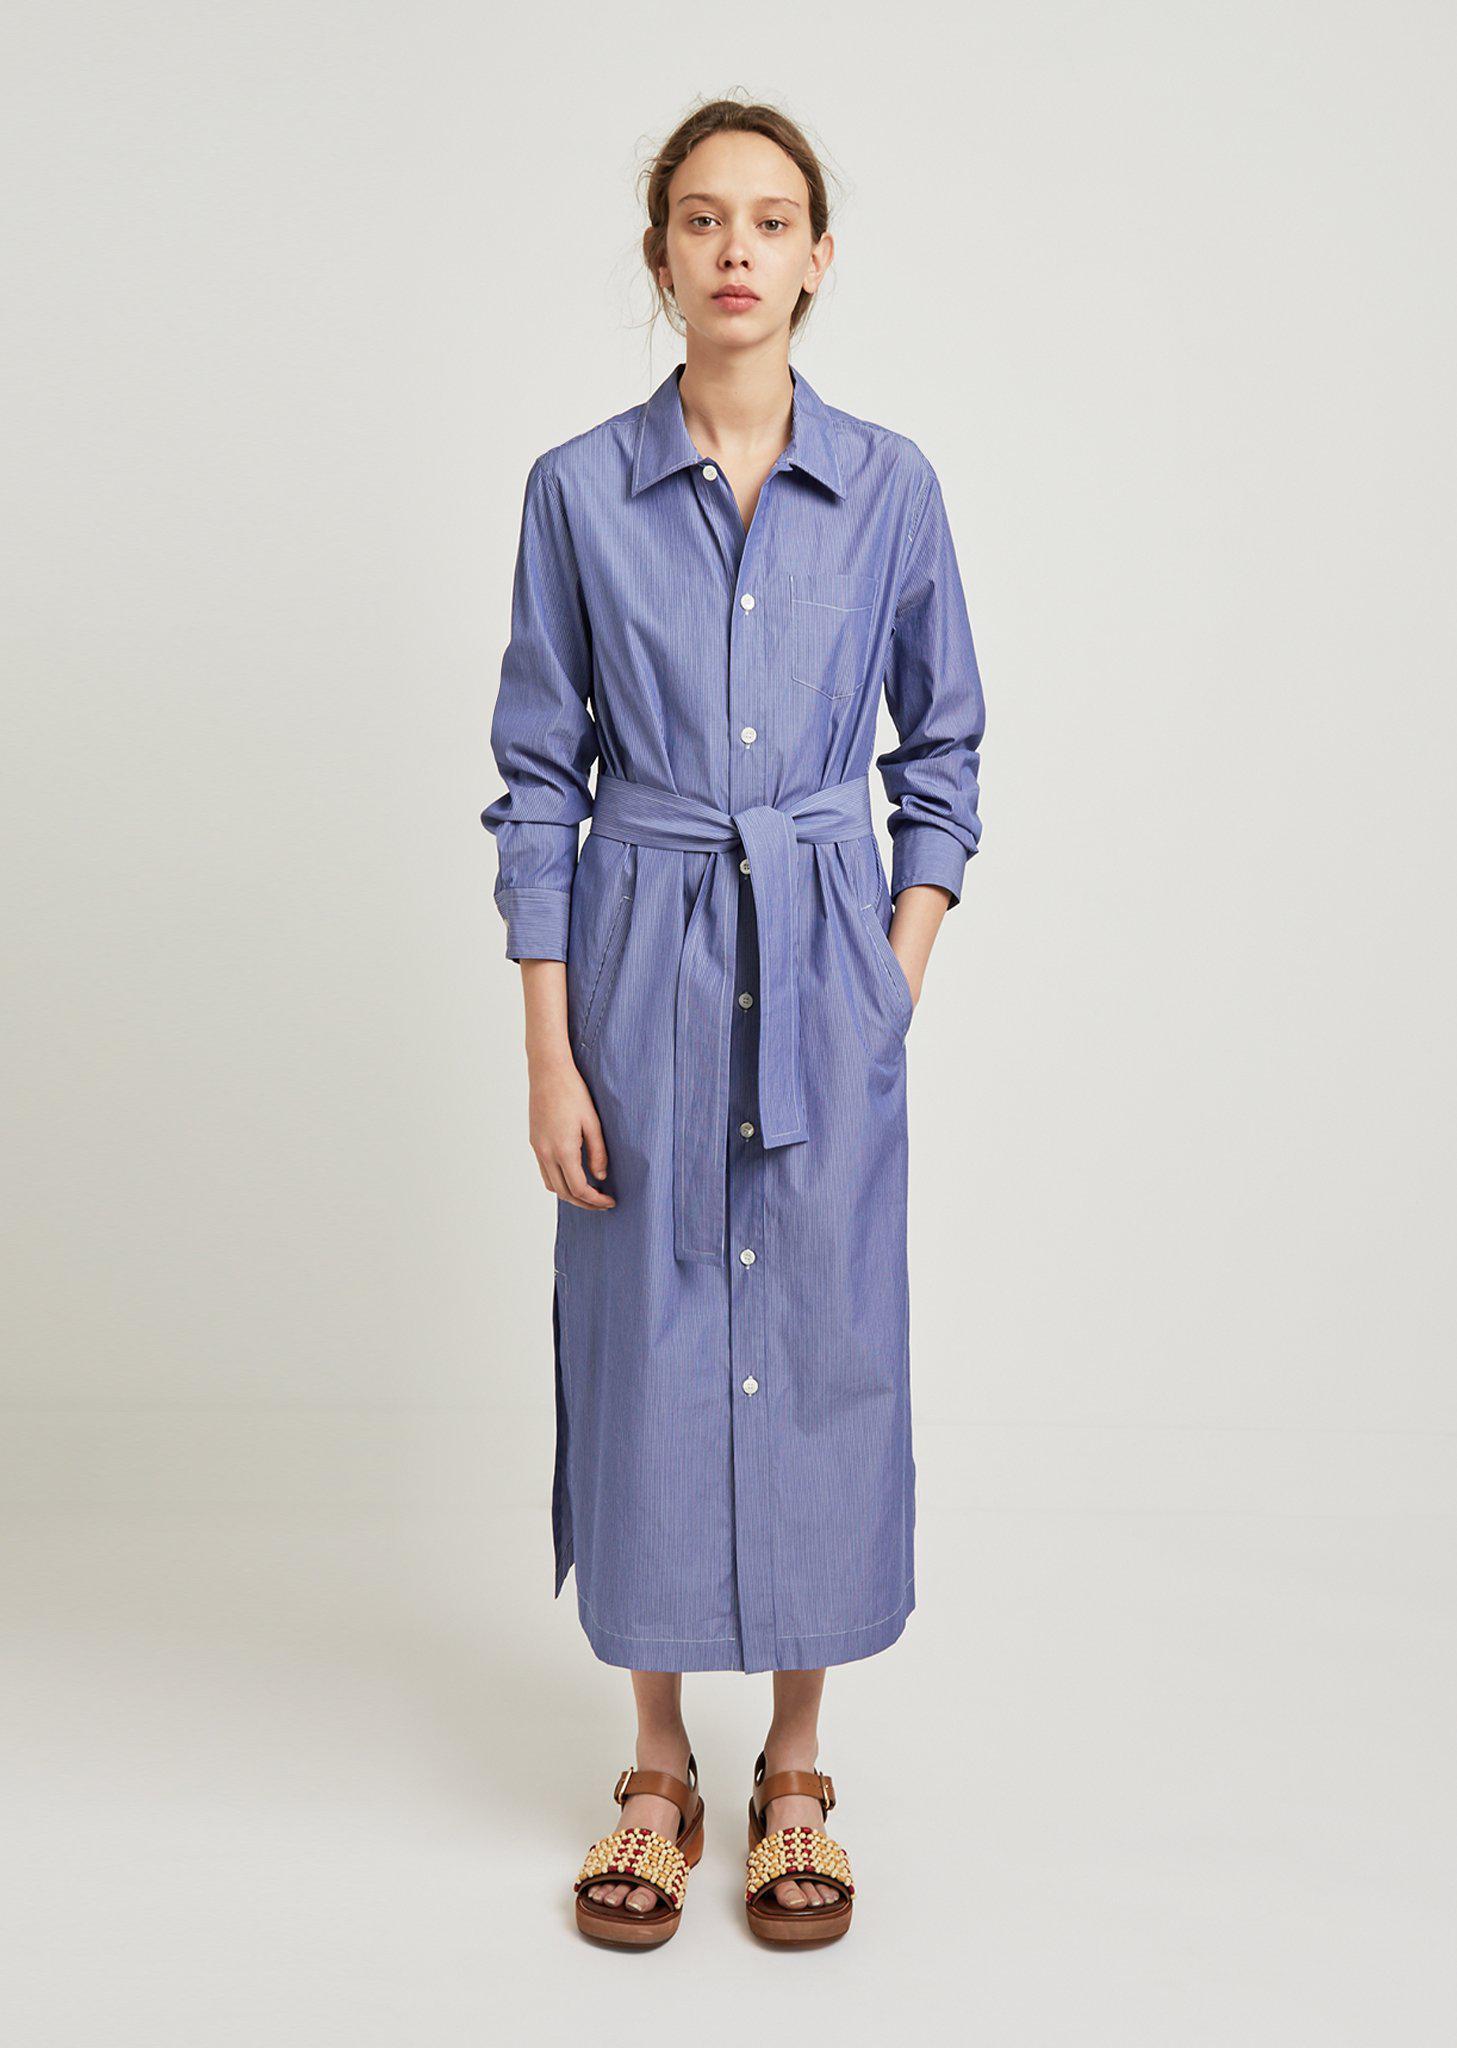 Millie tie-waist striped cotton-poplin dress A.P.C. Sale Geniue Stockist Cheapest Price For Sale 8TPGXdykFA